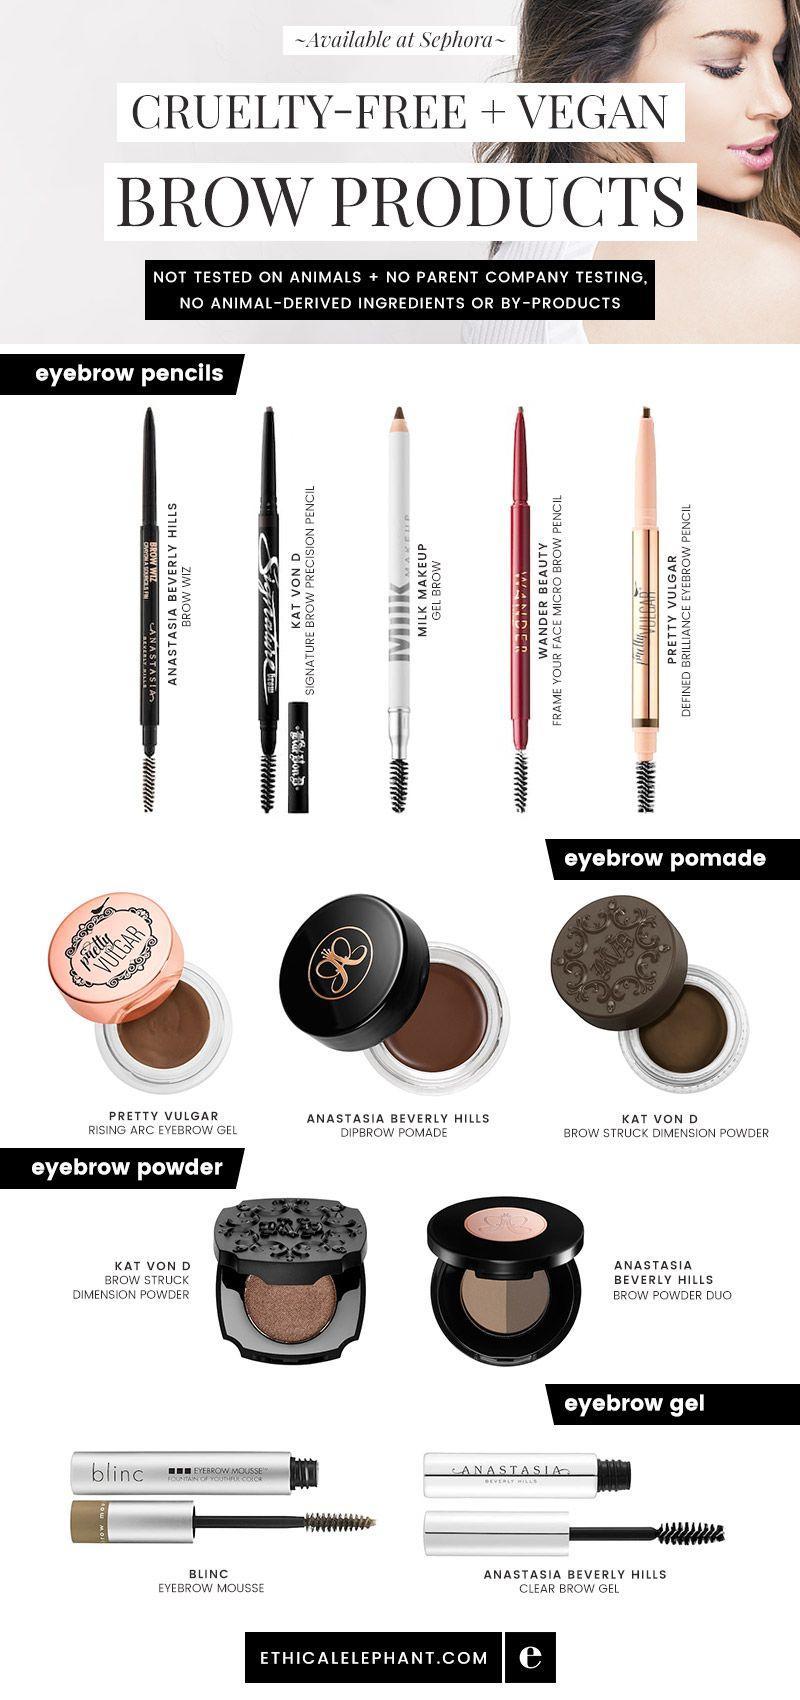 Photo of Cruelty-Free & Vegan Eyebrow Makeup | Available at Sephora